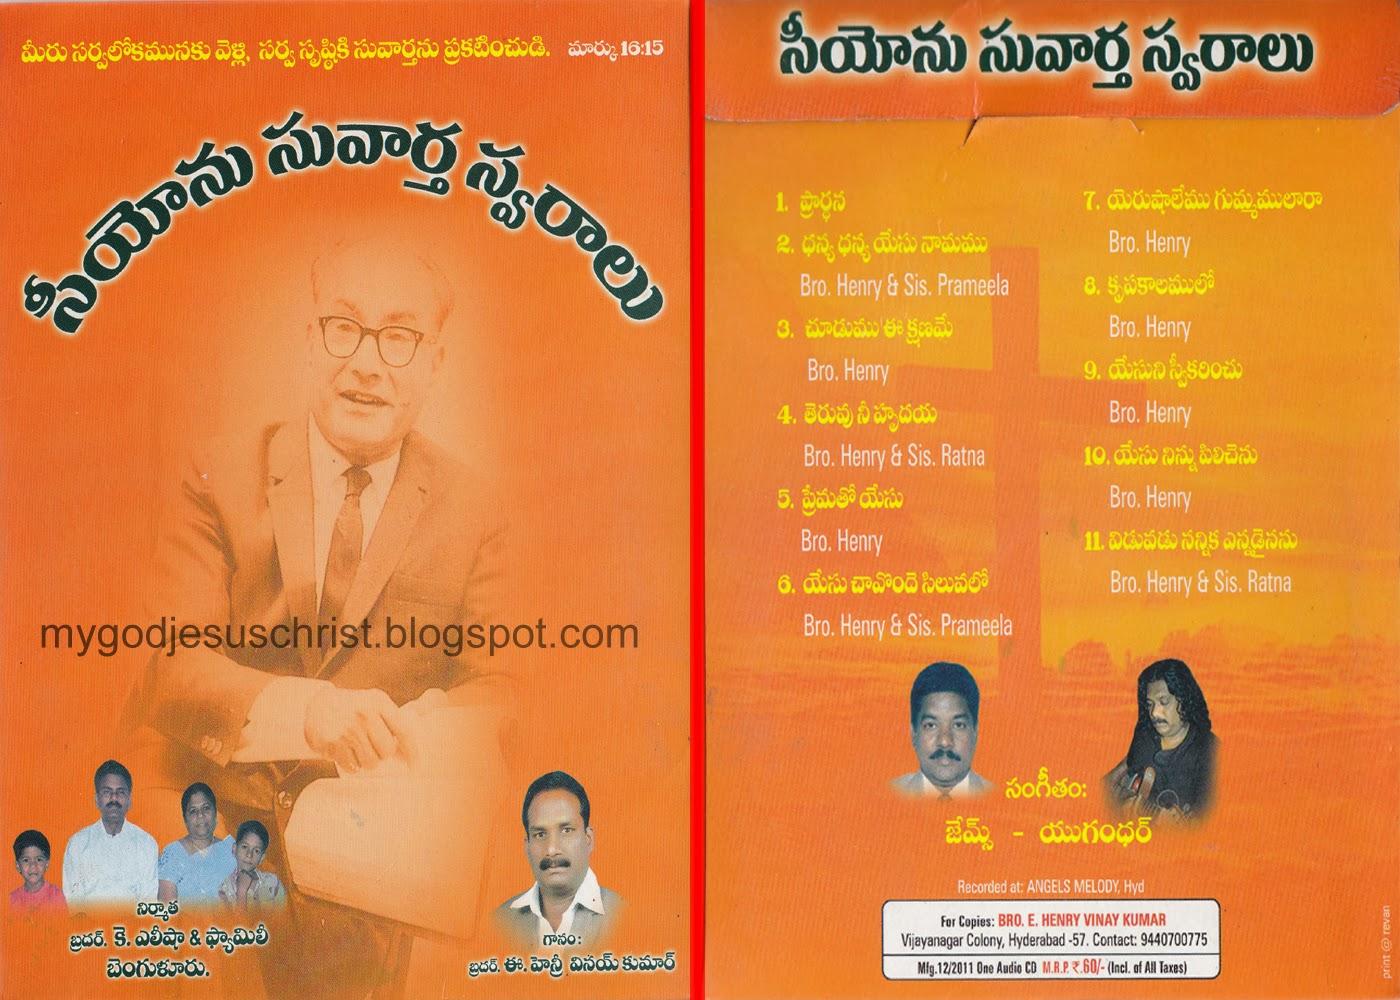 Old Telugu Music: Singer - S.P.Balu Old telugu mp3 hit songs